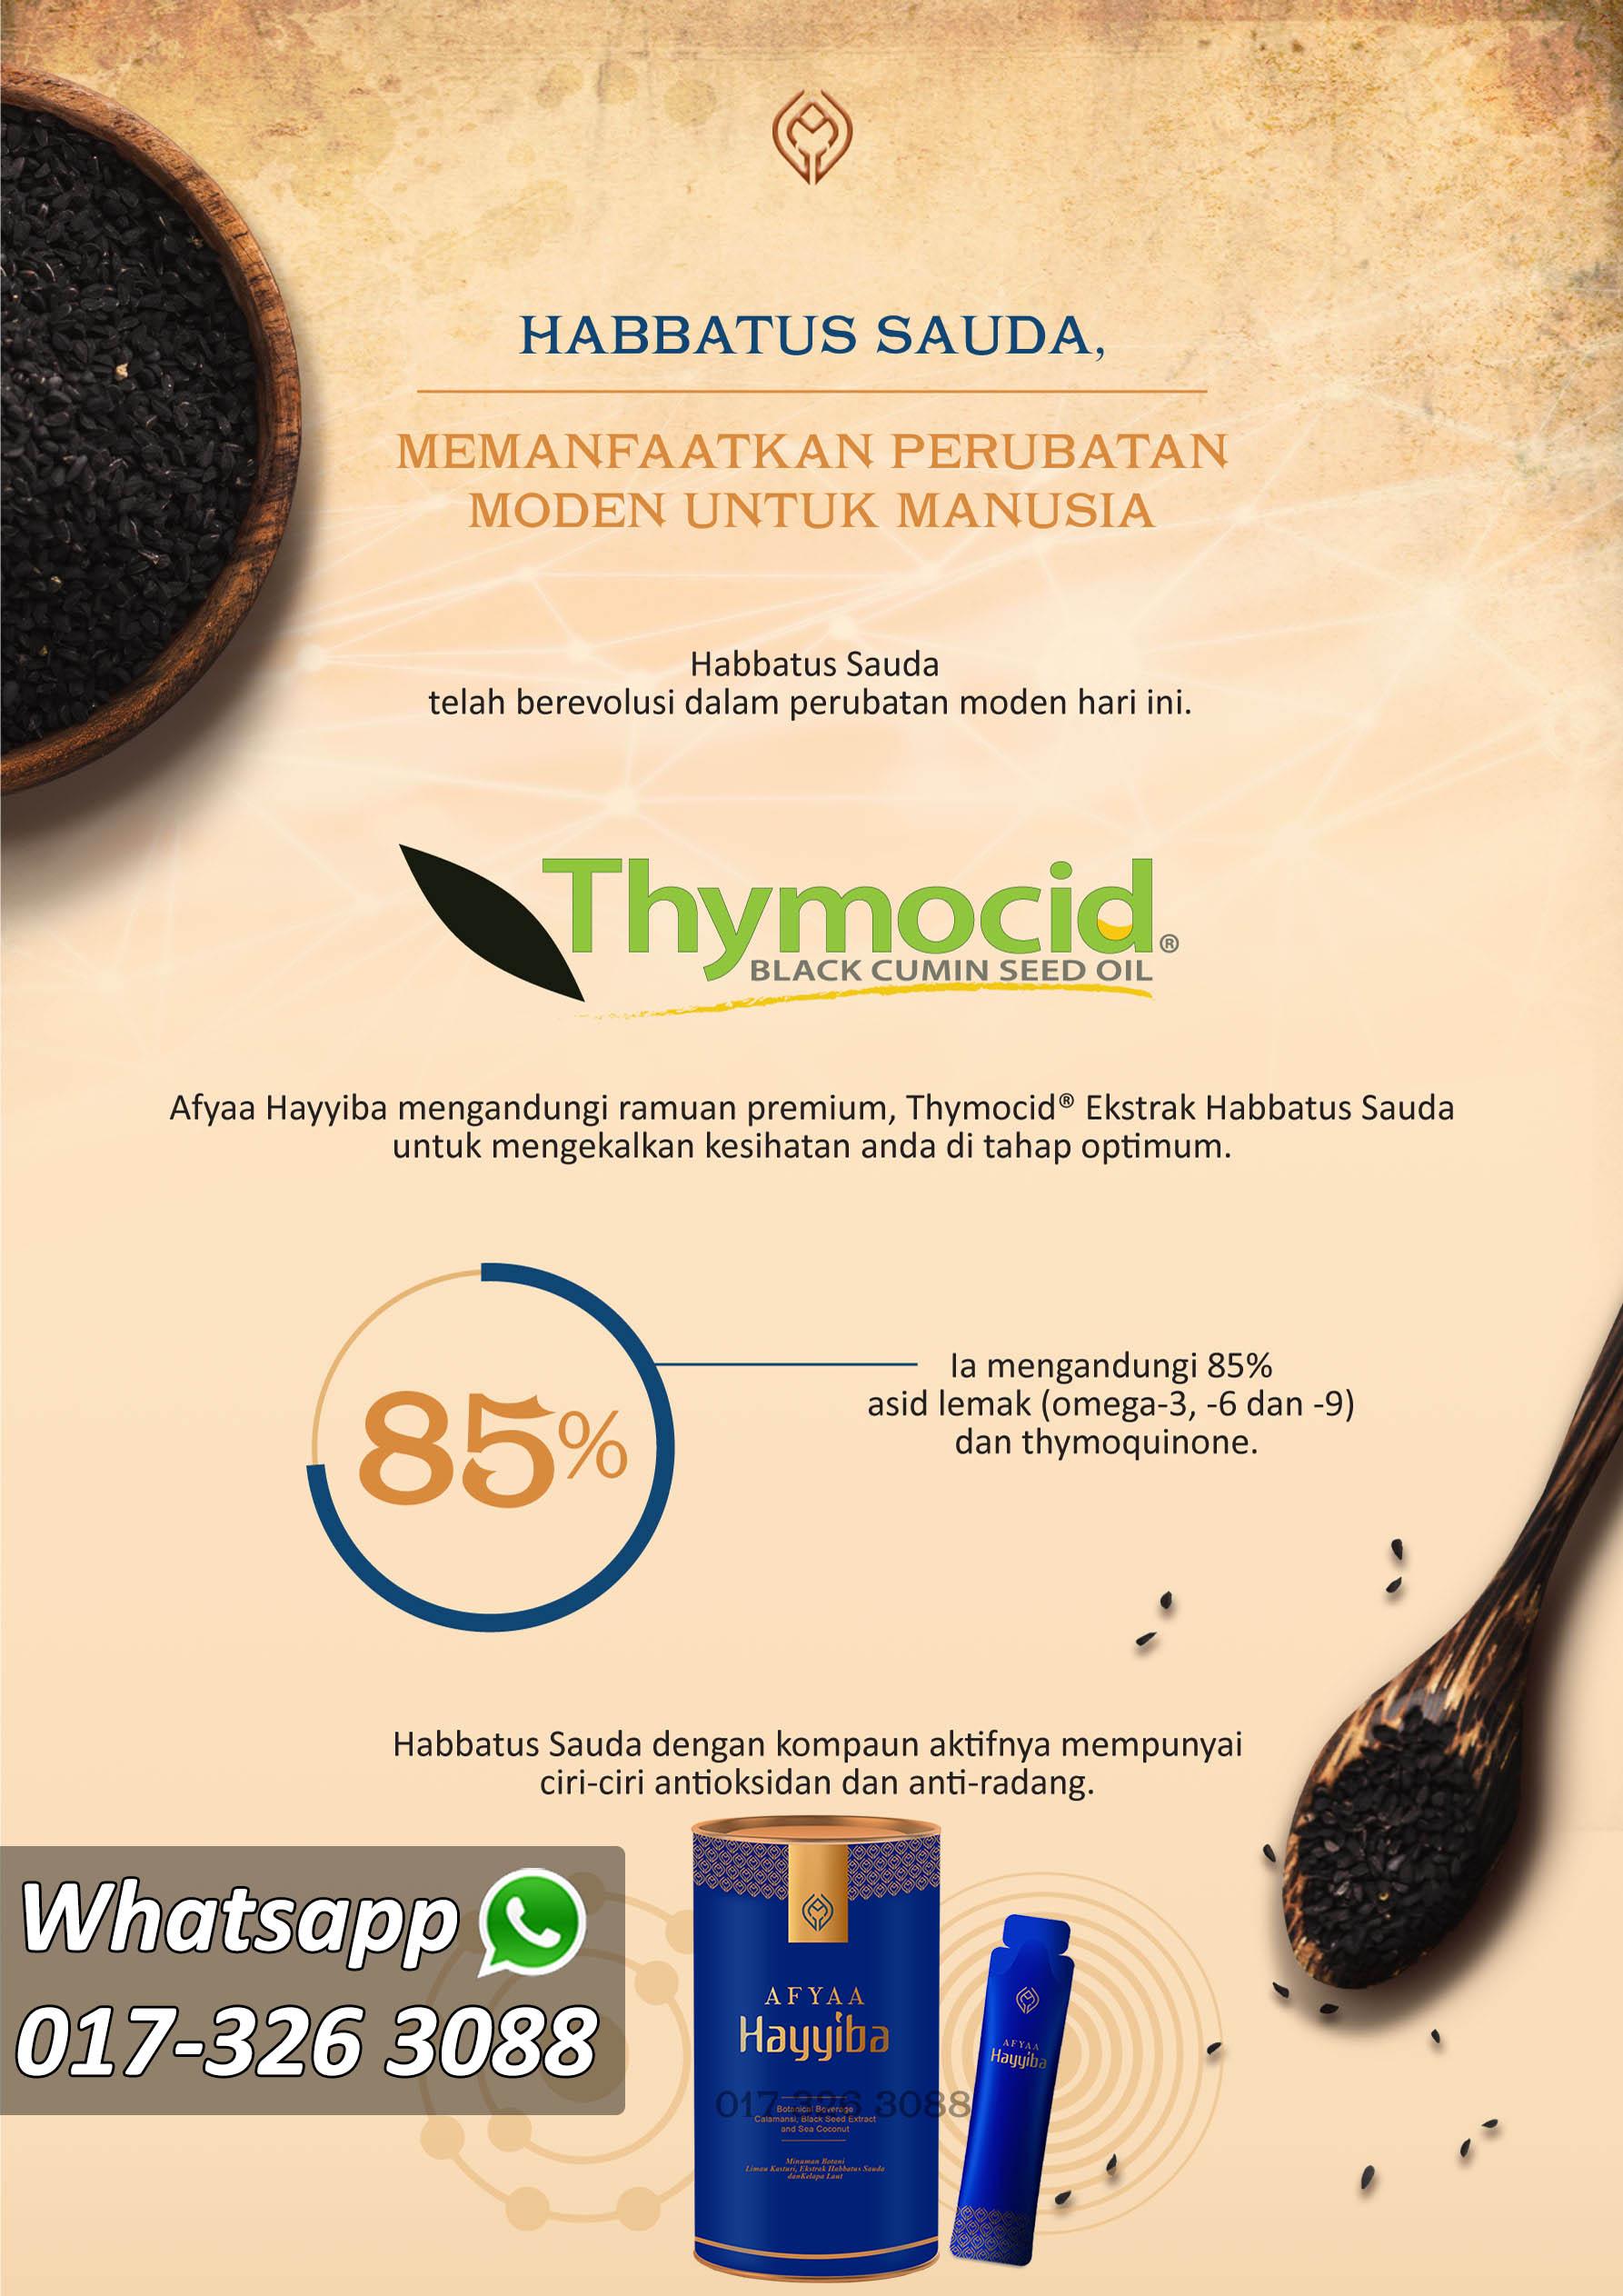 Thymocid.jpg